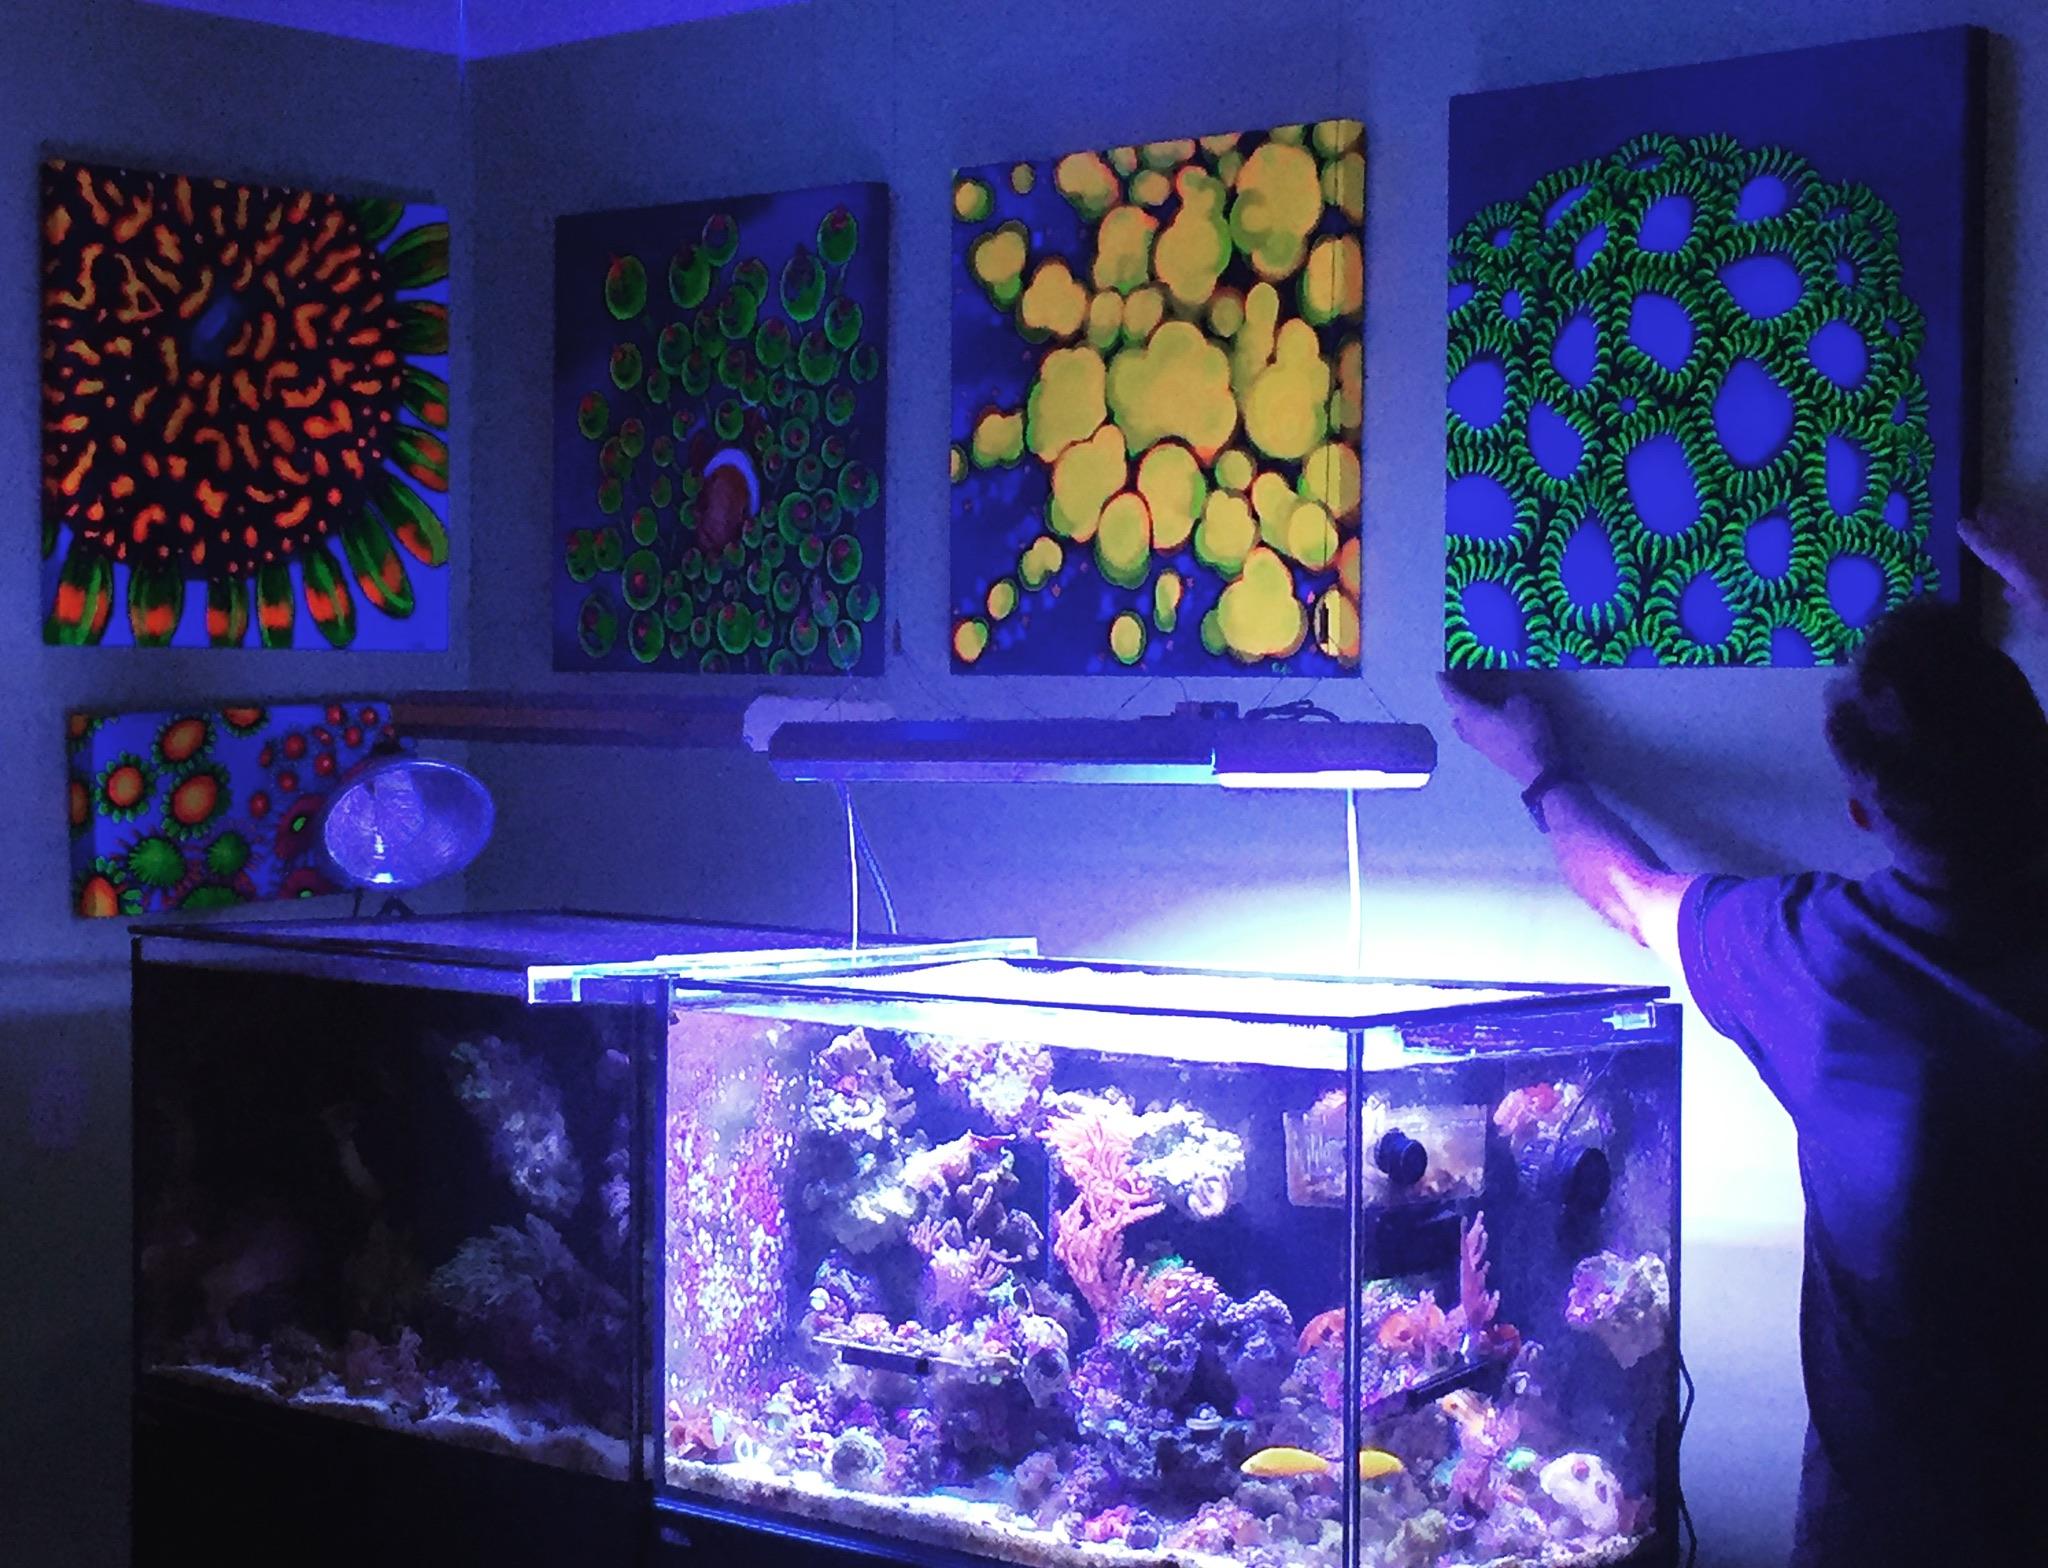 Jeff hanging some work above my reef and macro tanks - my original goal!